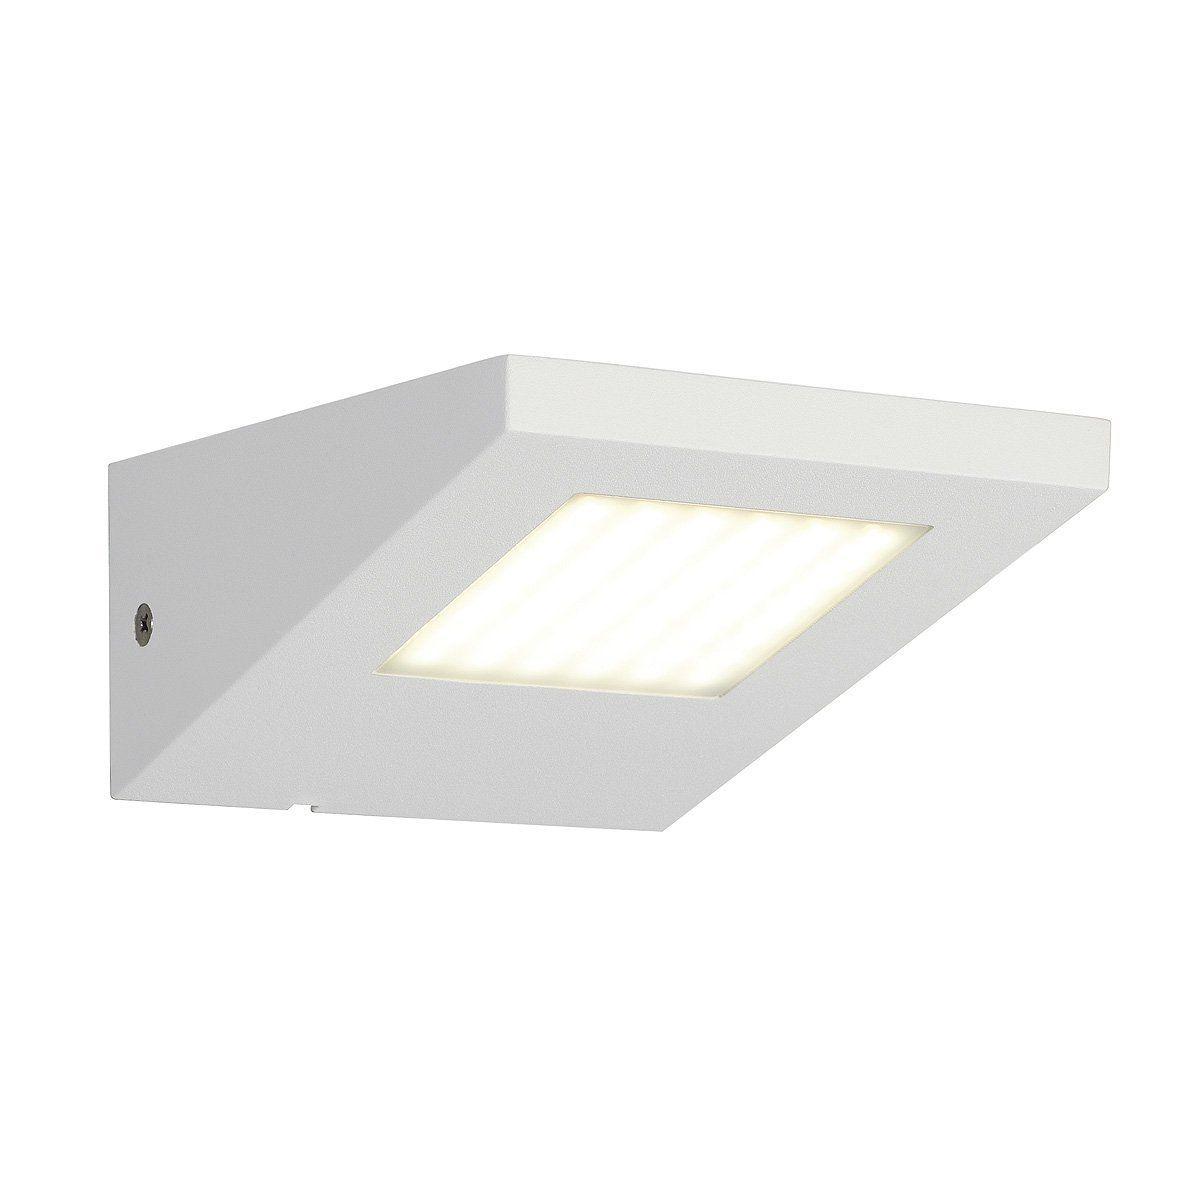 Slv 231311 Iperi Wl Wall Light White 48 Led Neutral White